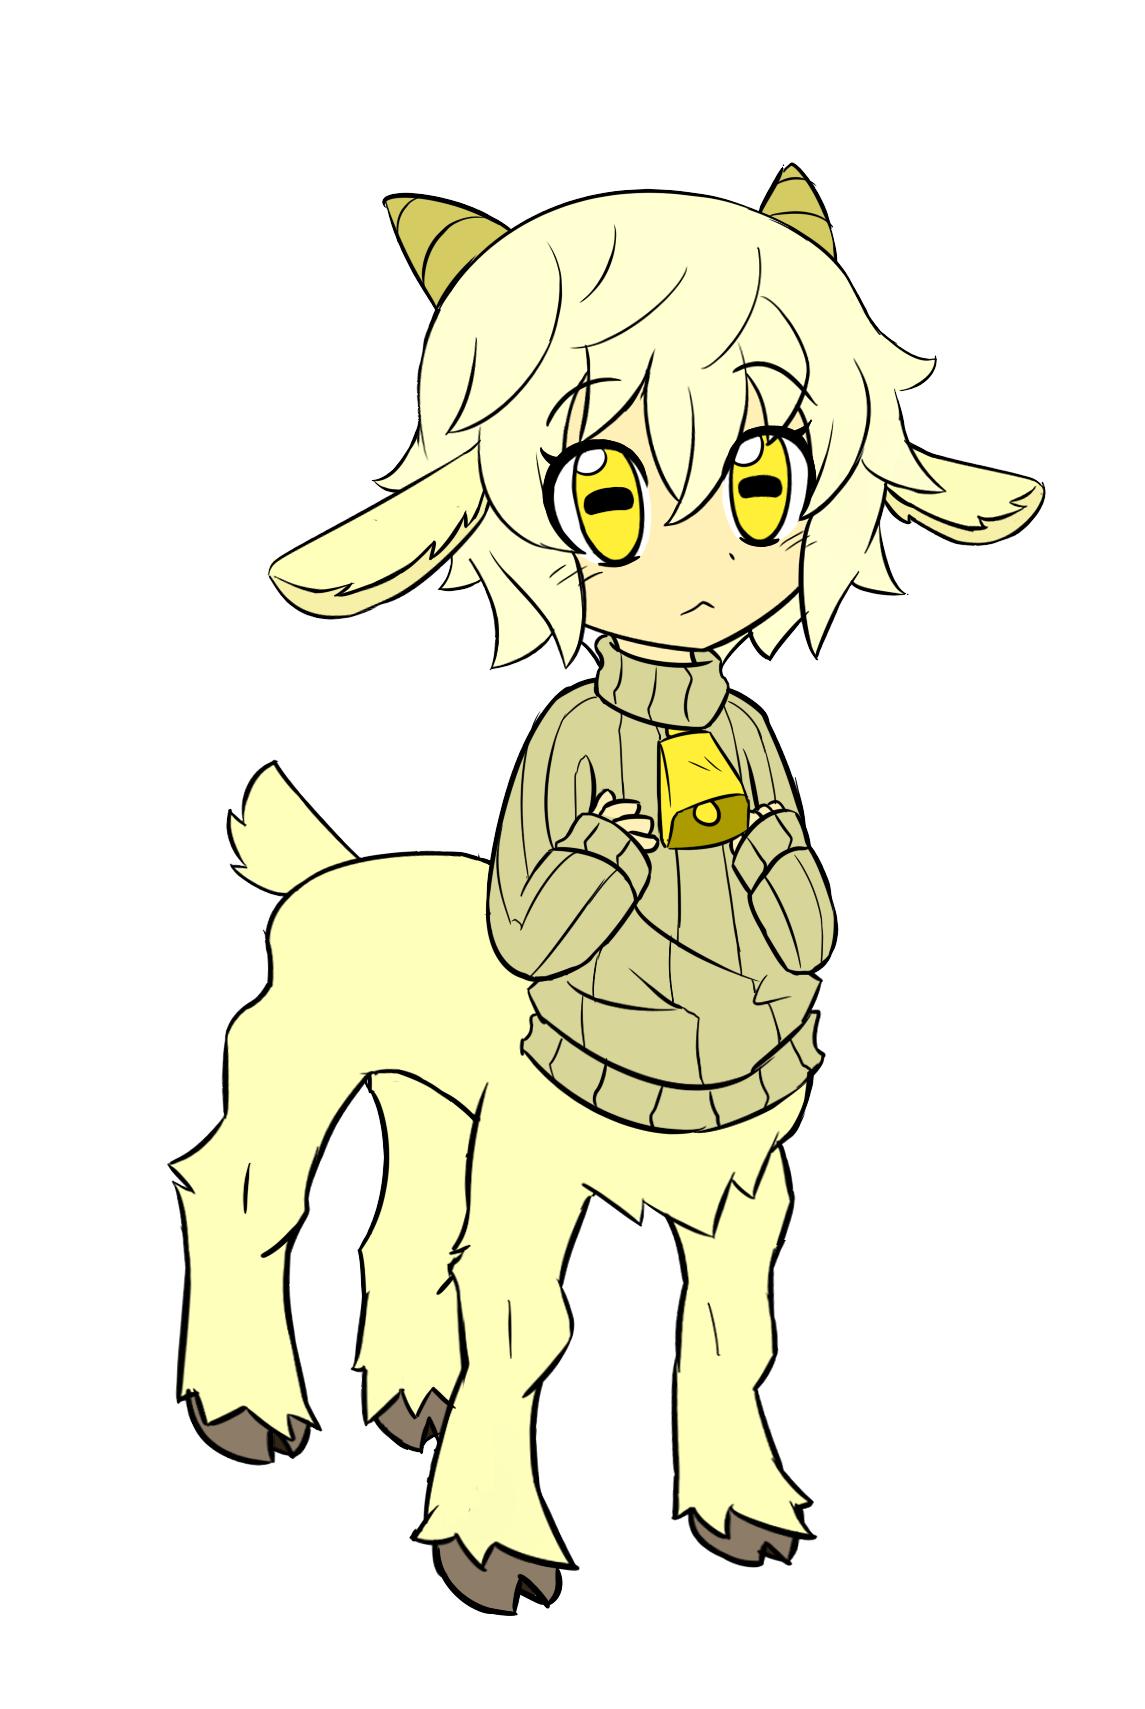 Fainting Goat Girl Centaur